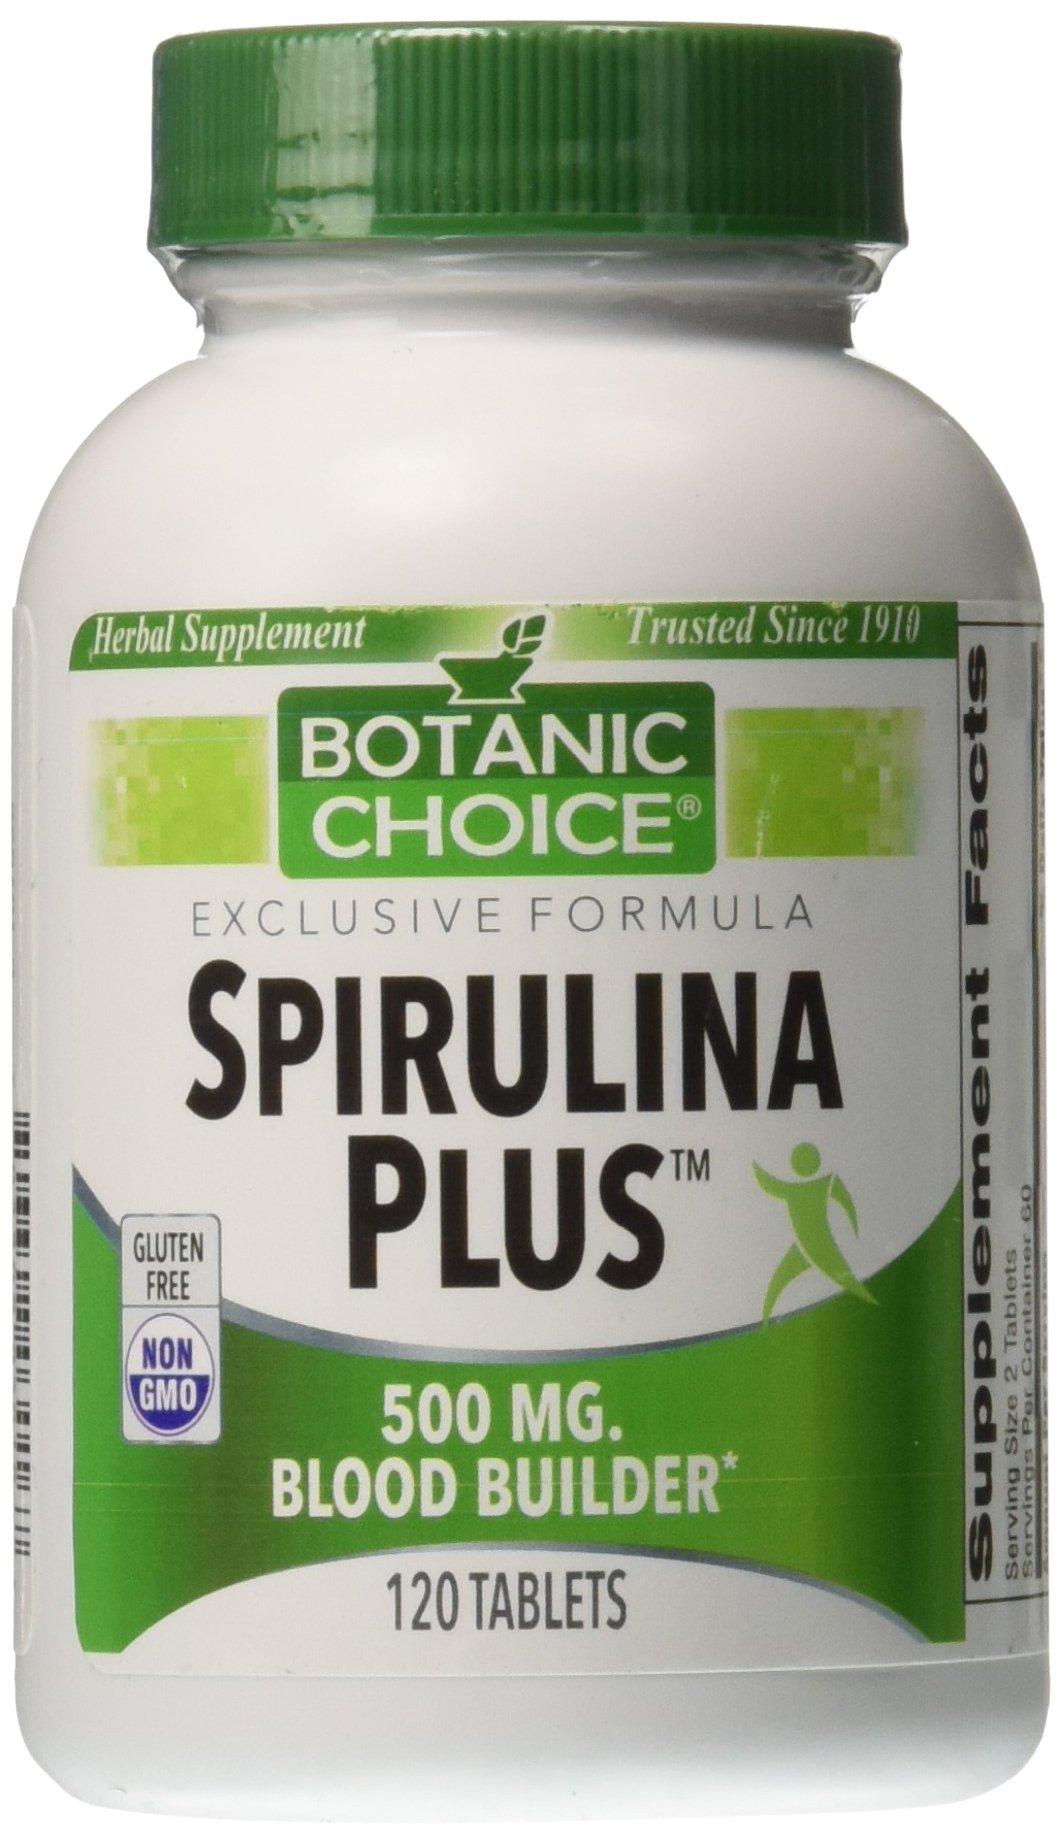 Botanic Choice Spirulina Plus 500 mg,120 Tablets (Pack of 5)